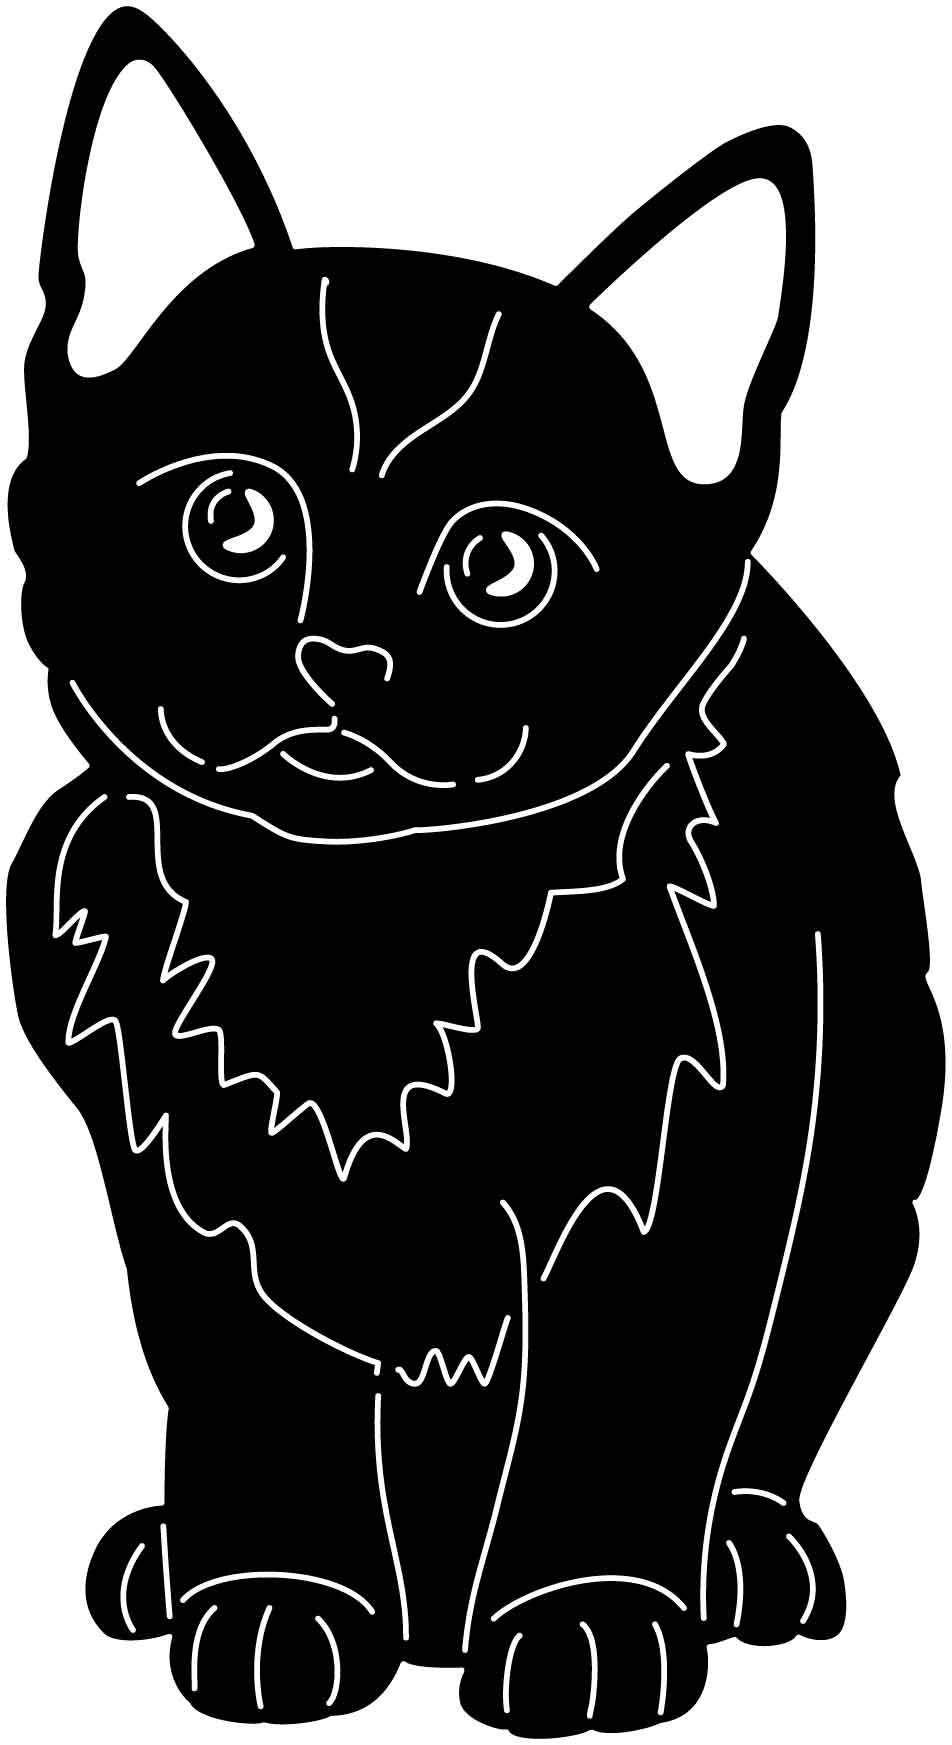 Small Kitten Free DXF file Small kittens, Cnc design